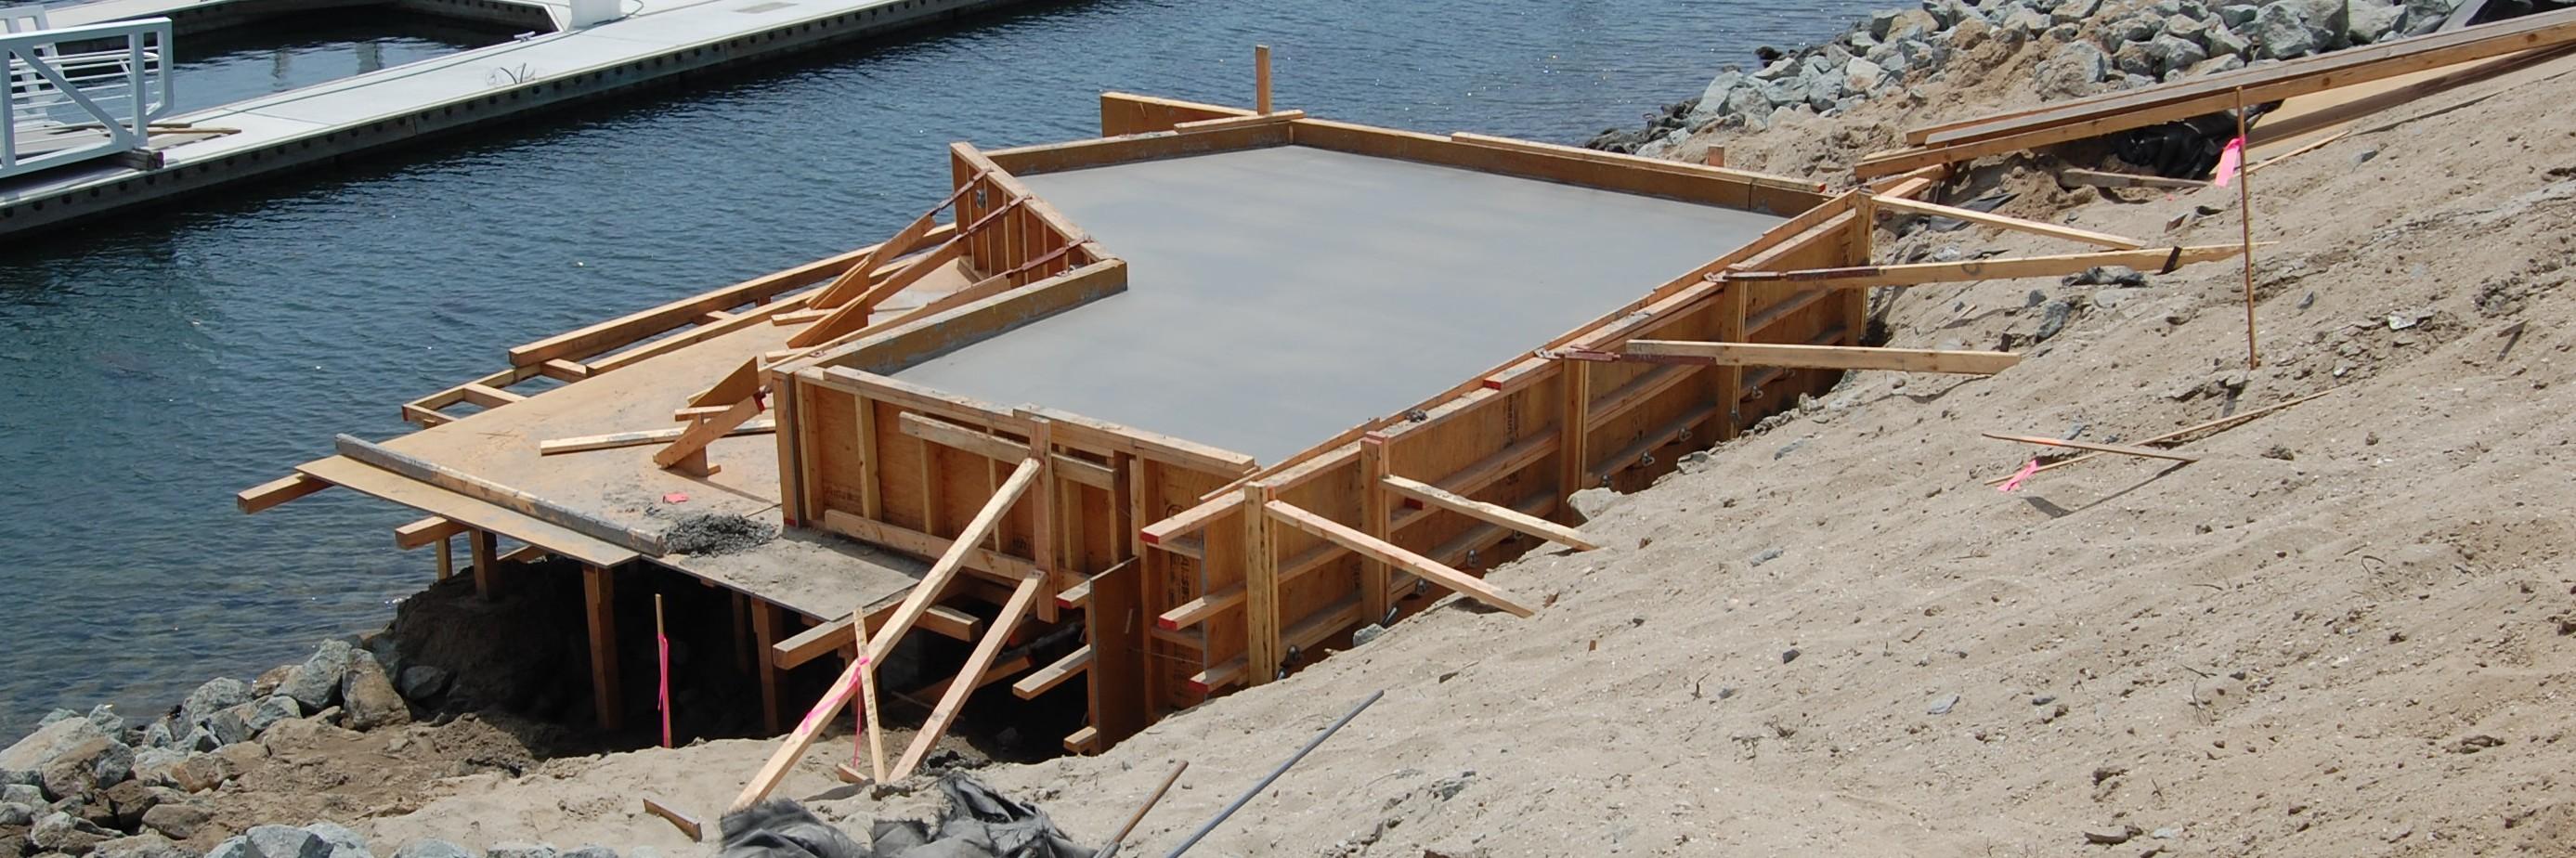 Shoreline Structures – Pier 32 Marina